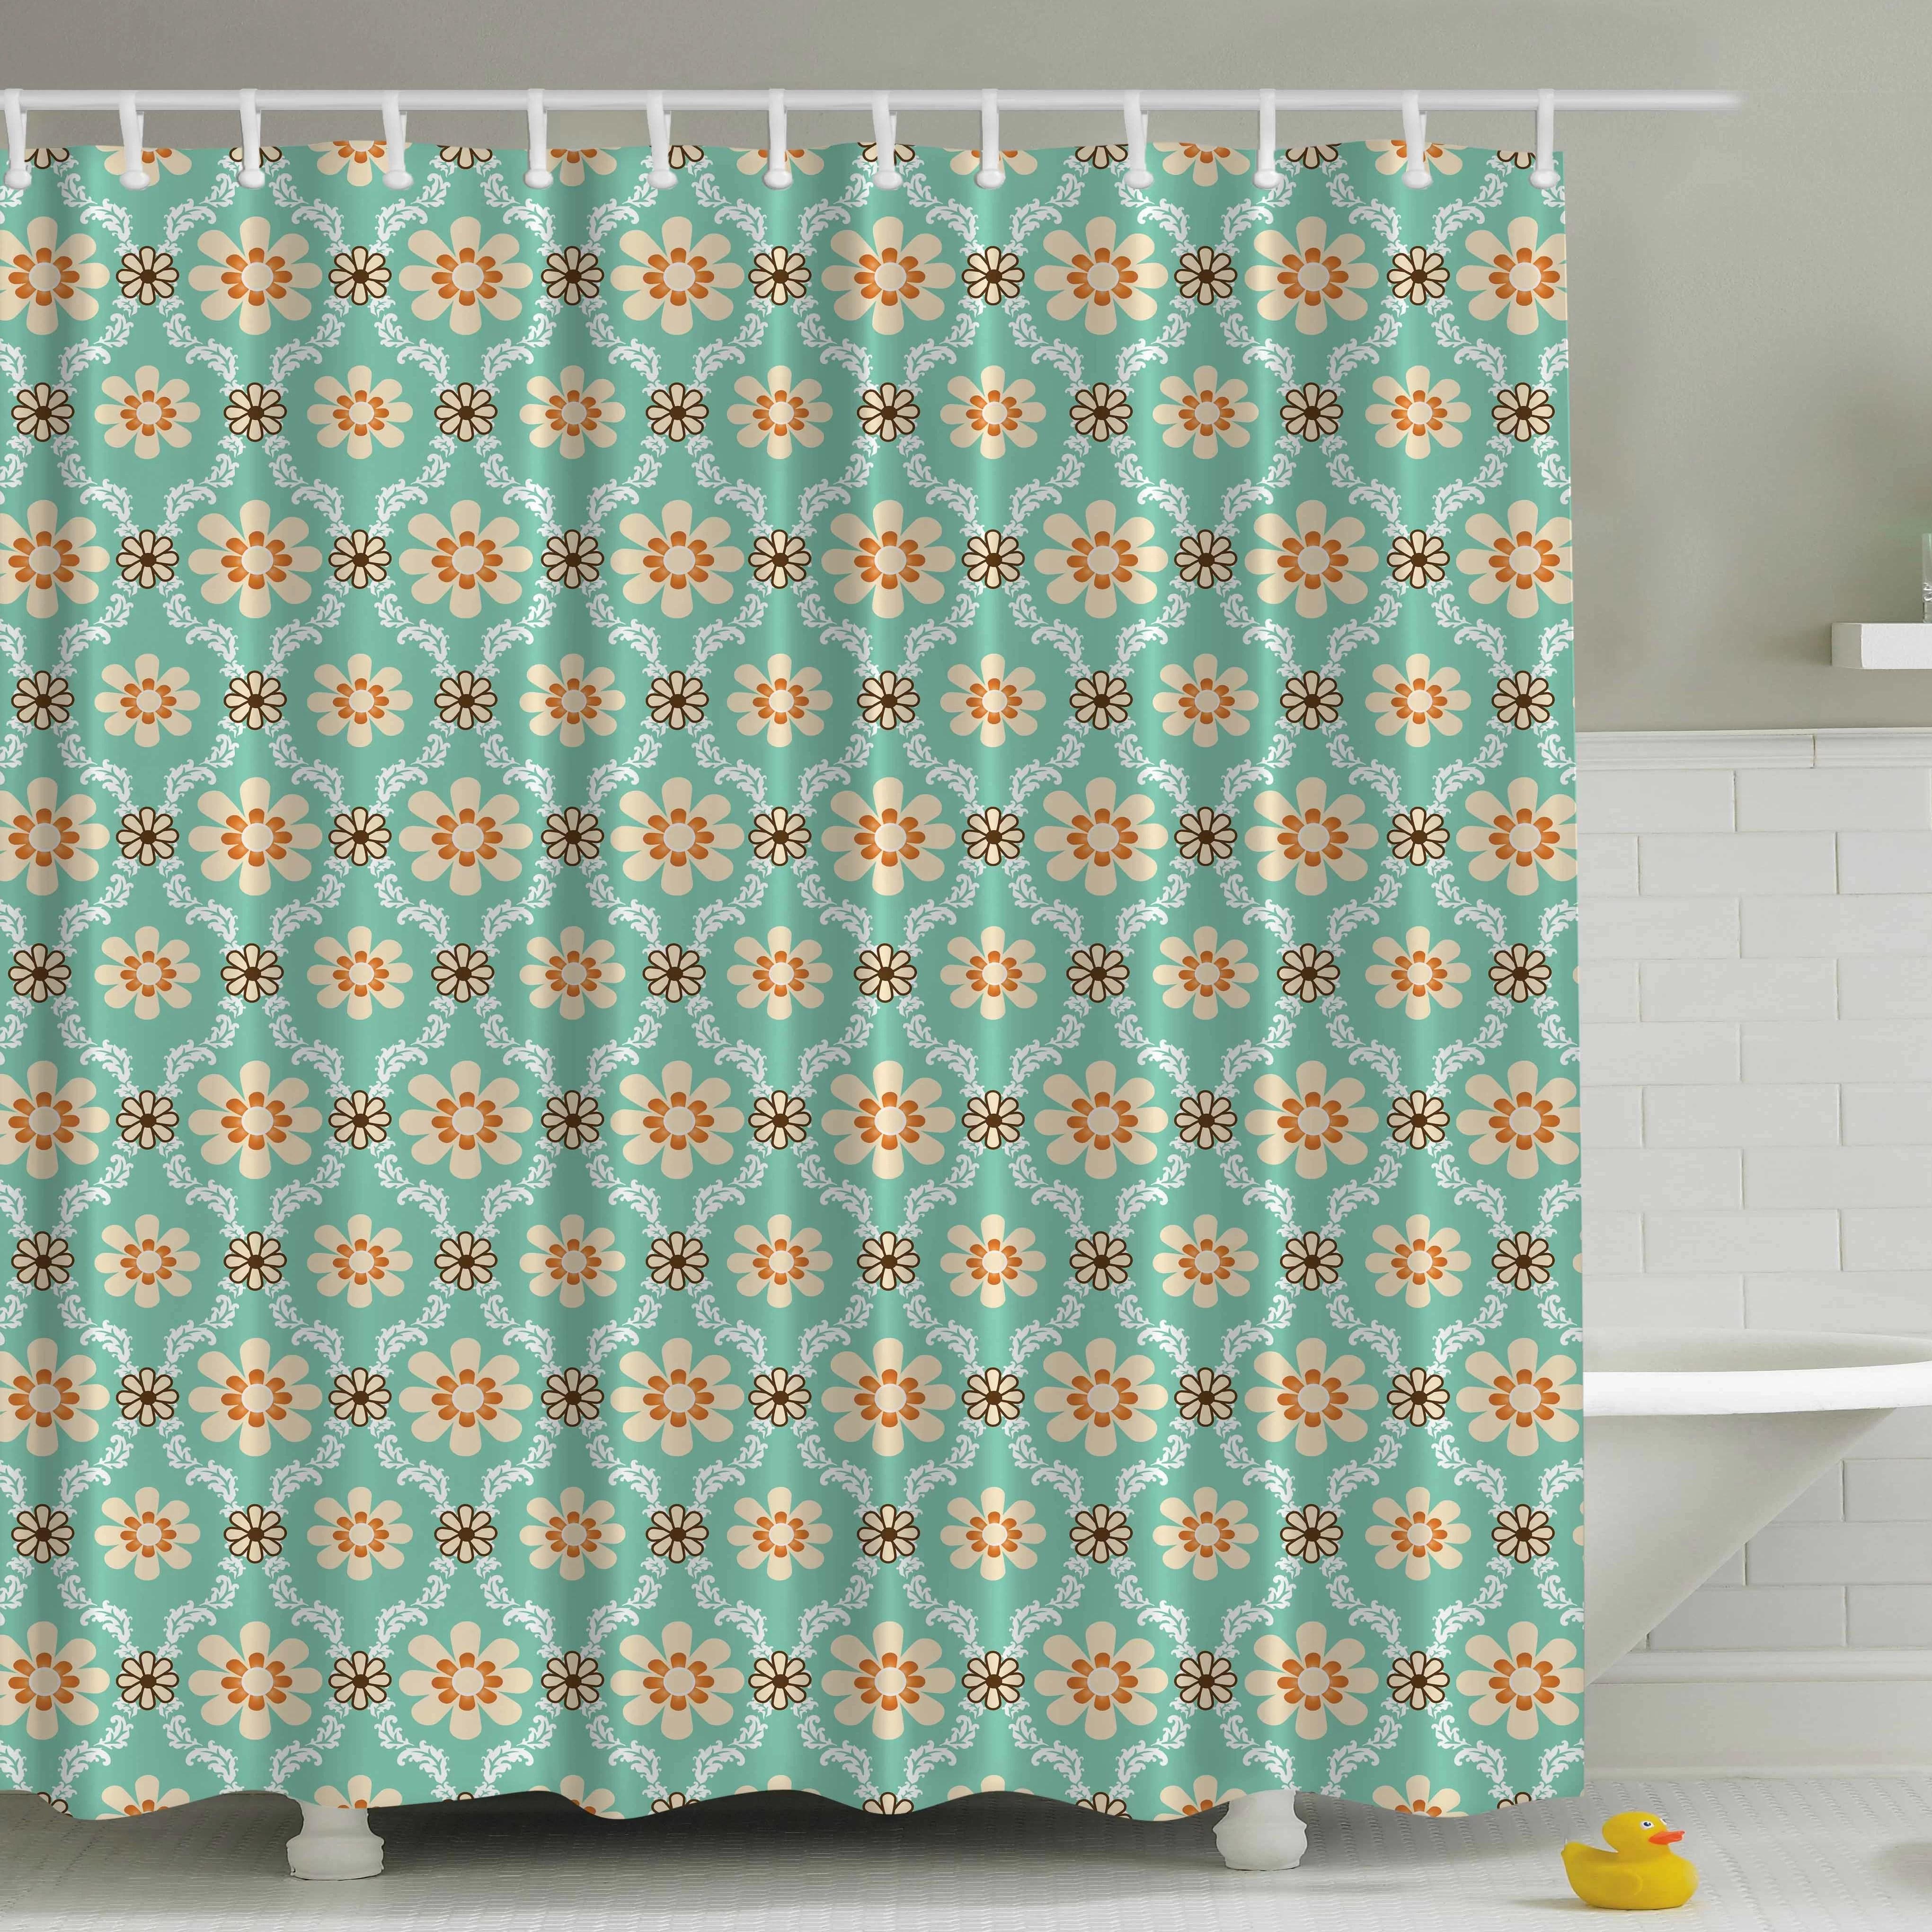 rustic cactus wood shower curtain bathroom waterproof fabric hook mat home decor shower curtains home garden